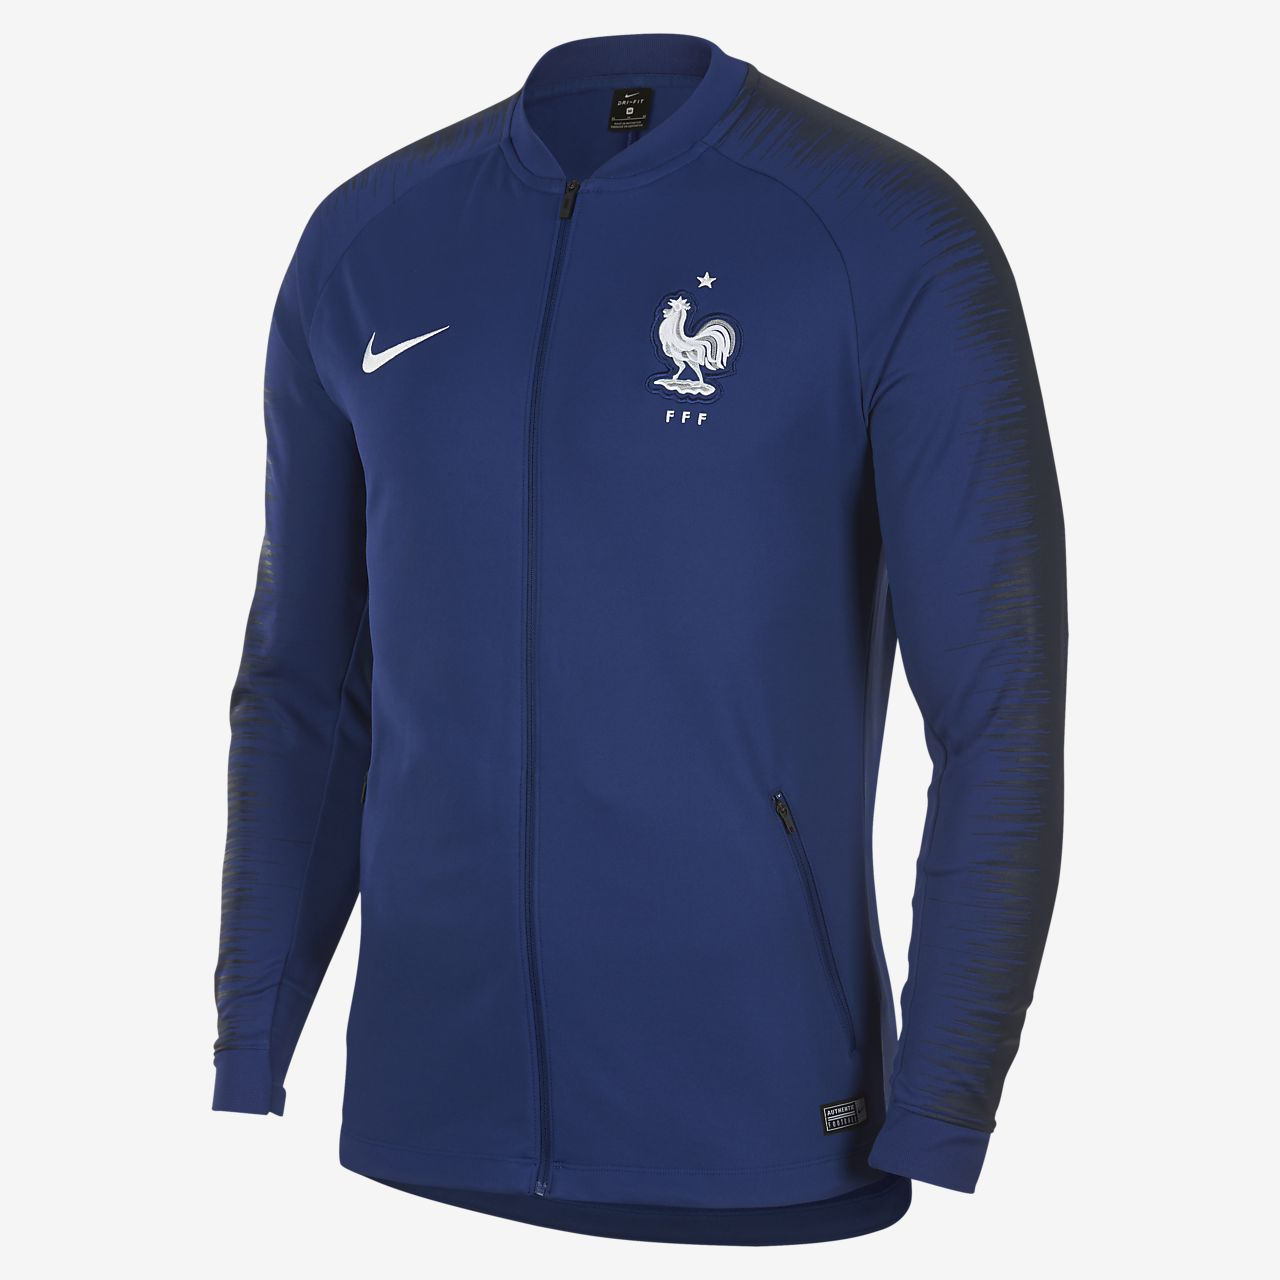 624f745cb FFF Anthem Men's Football Jacket. Nike.com MY